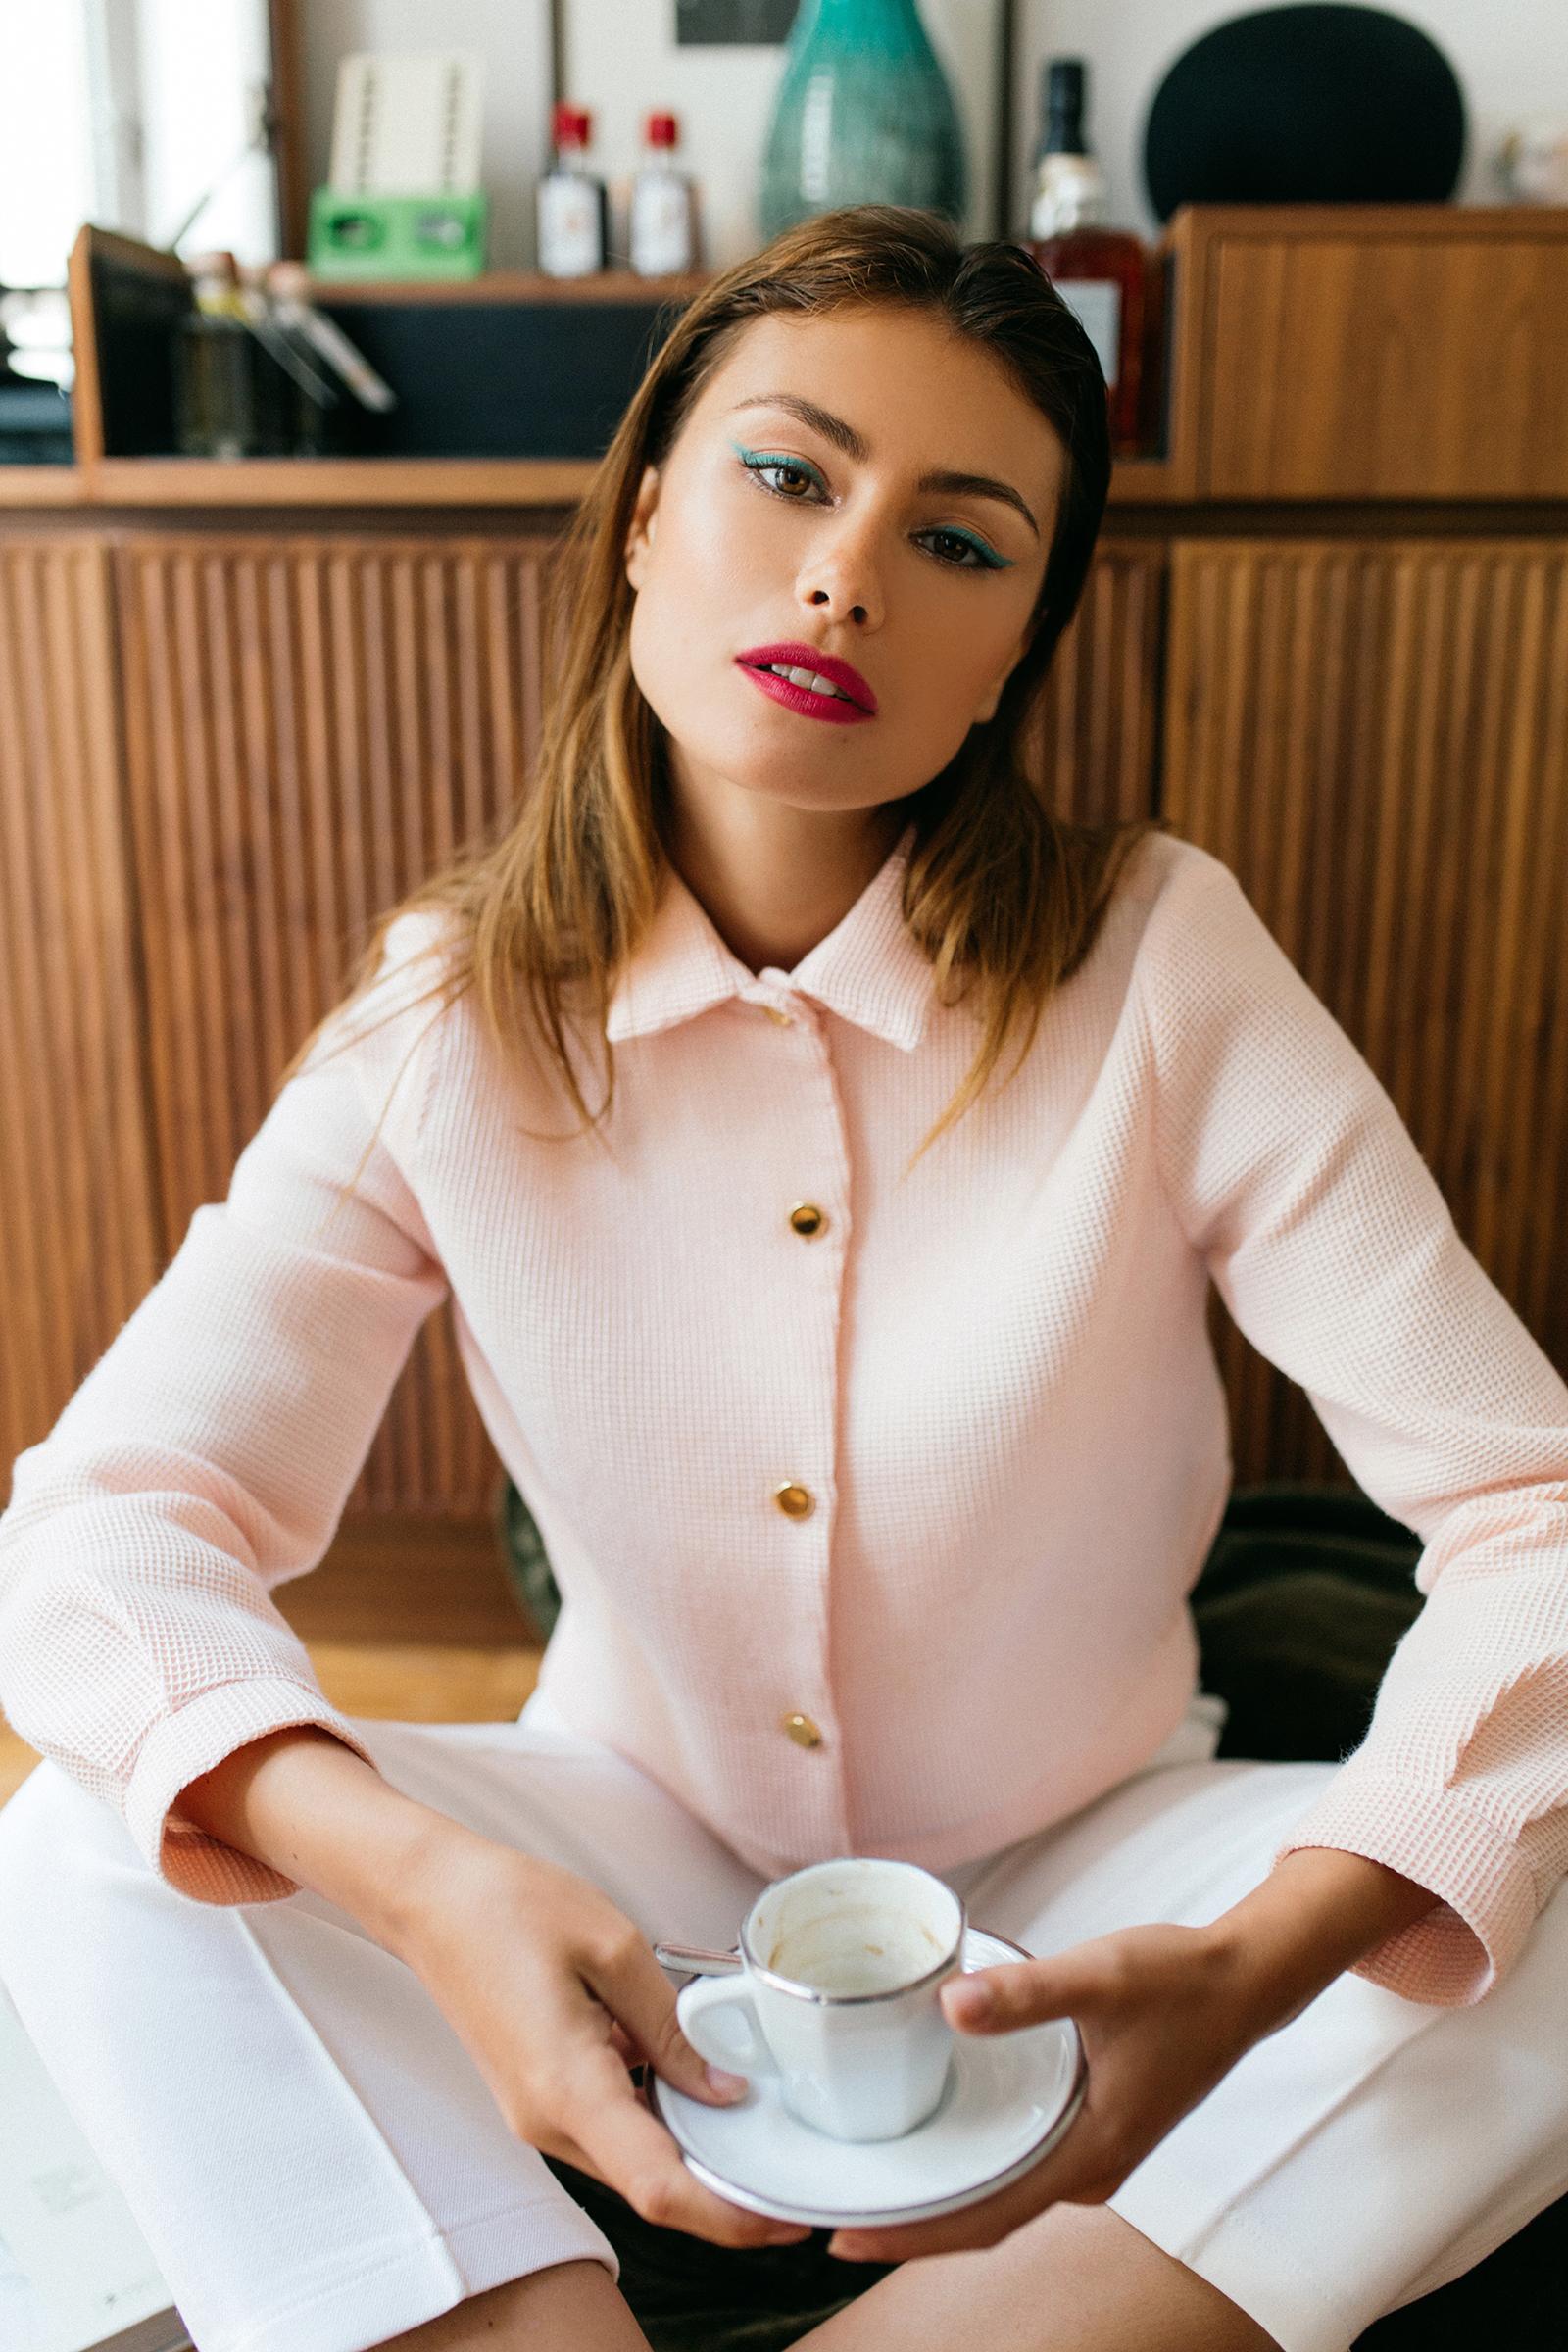 editorial_Yasmine-Ravel_anne-charlotte-moreau_06